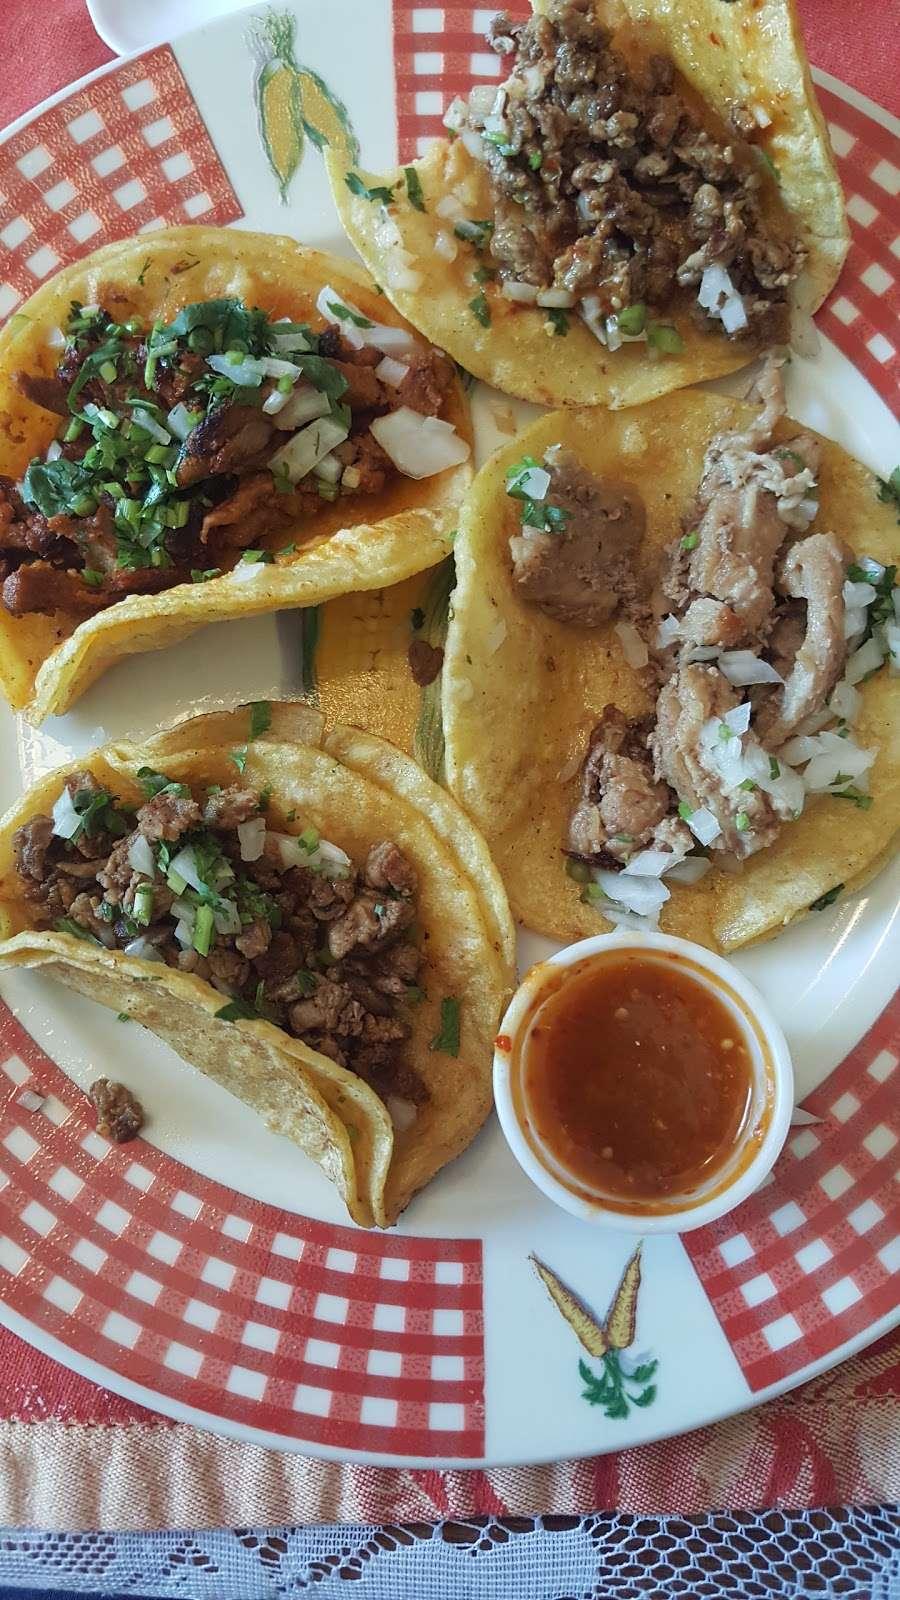 Mi PUEBLITO - restaurant    Photo 4 of 10   Address: 1202 Allen Genoa Rd, Houston, TX 77017, USA   Phone: (713) 815-1158